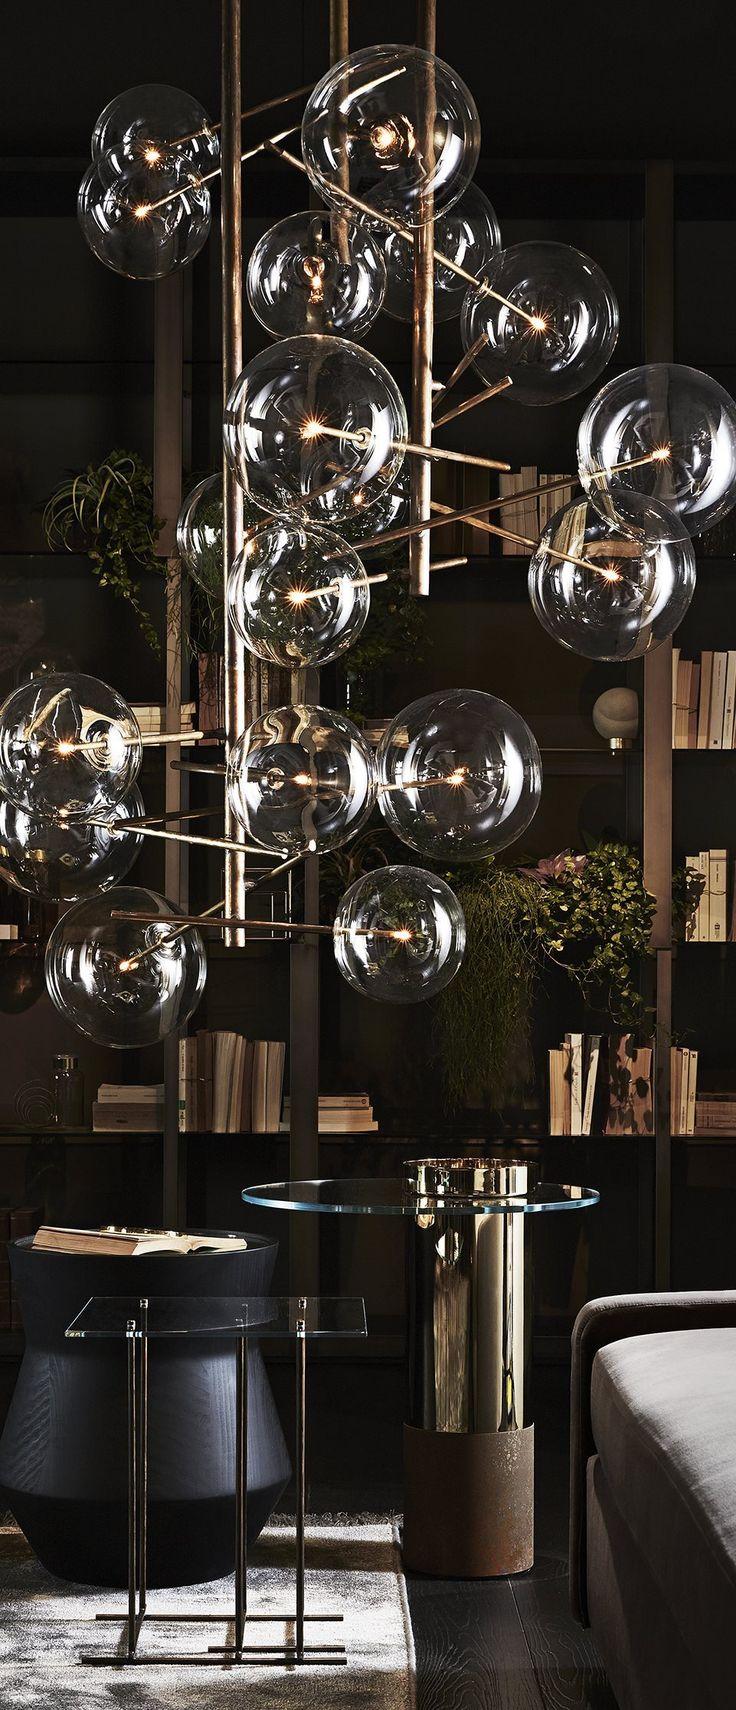 MODERN LIGHTING   luxury furniture   www bocadolobo com   luxuryfurniture   designfurniture. 17 Best ideas about Luxury Furniture on Pinterest   Transitional